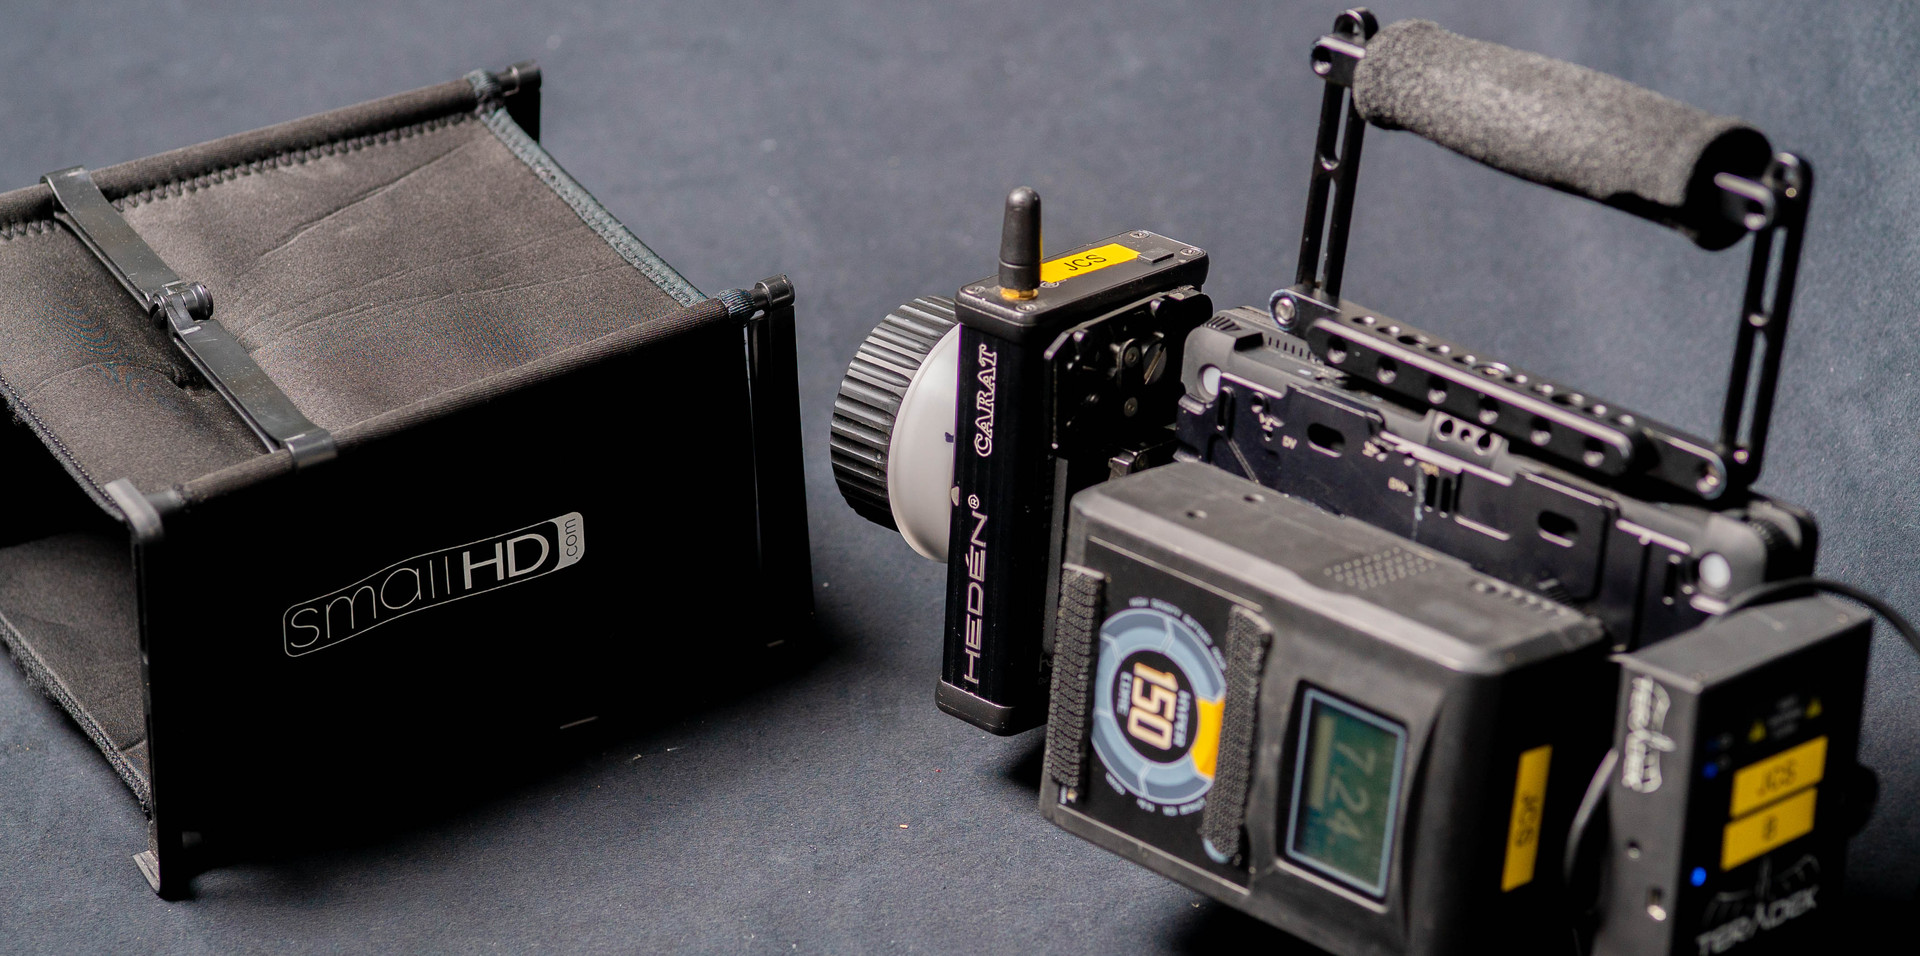 DSC06034.jpg